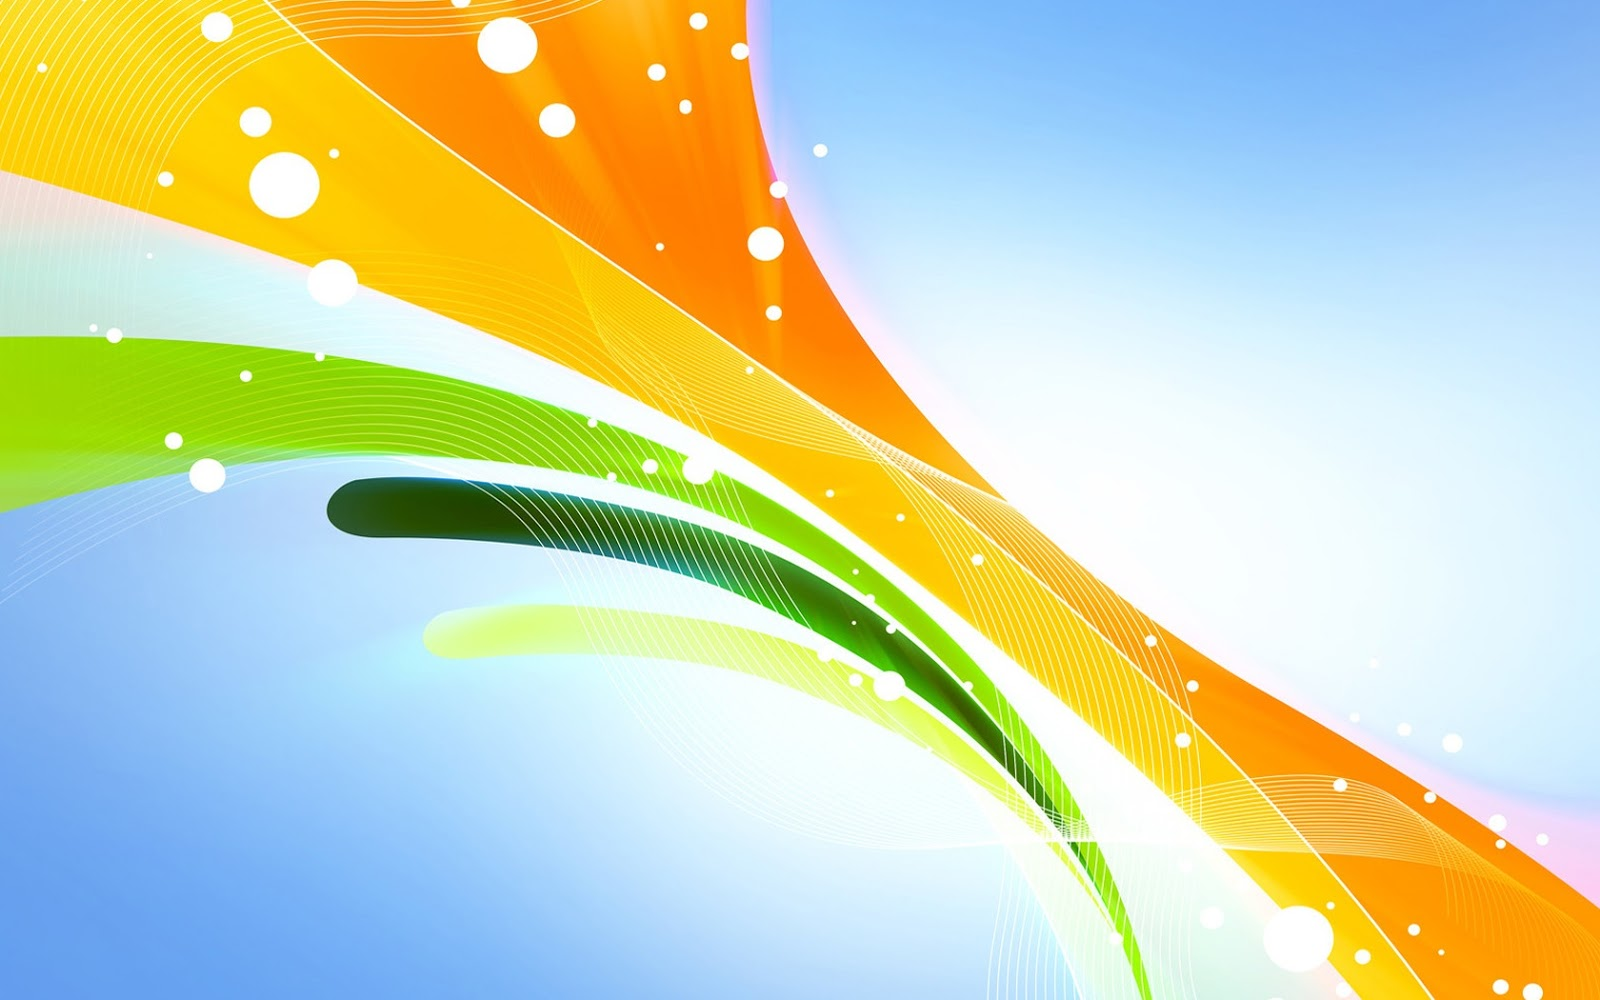 http://4.bp.blogspot.com/-0vIXhJ6vIVg/USV9QGBOfiI/AAAAAAAAW5c/-lDA1-BhaDg/s1600/Cintas-de-Colores-Wallpaper-www.programaswarez.org.jpg